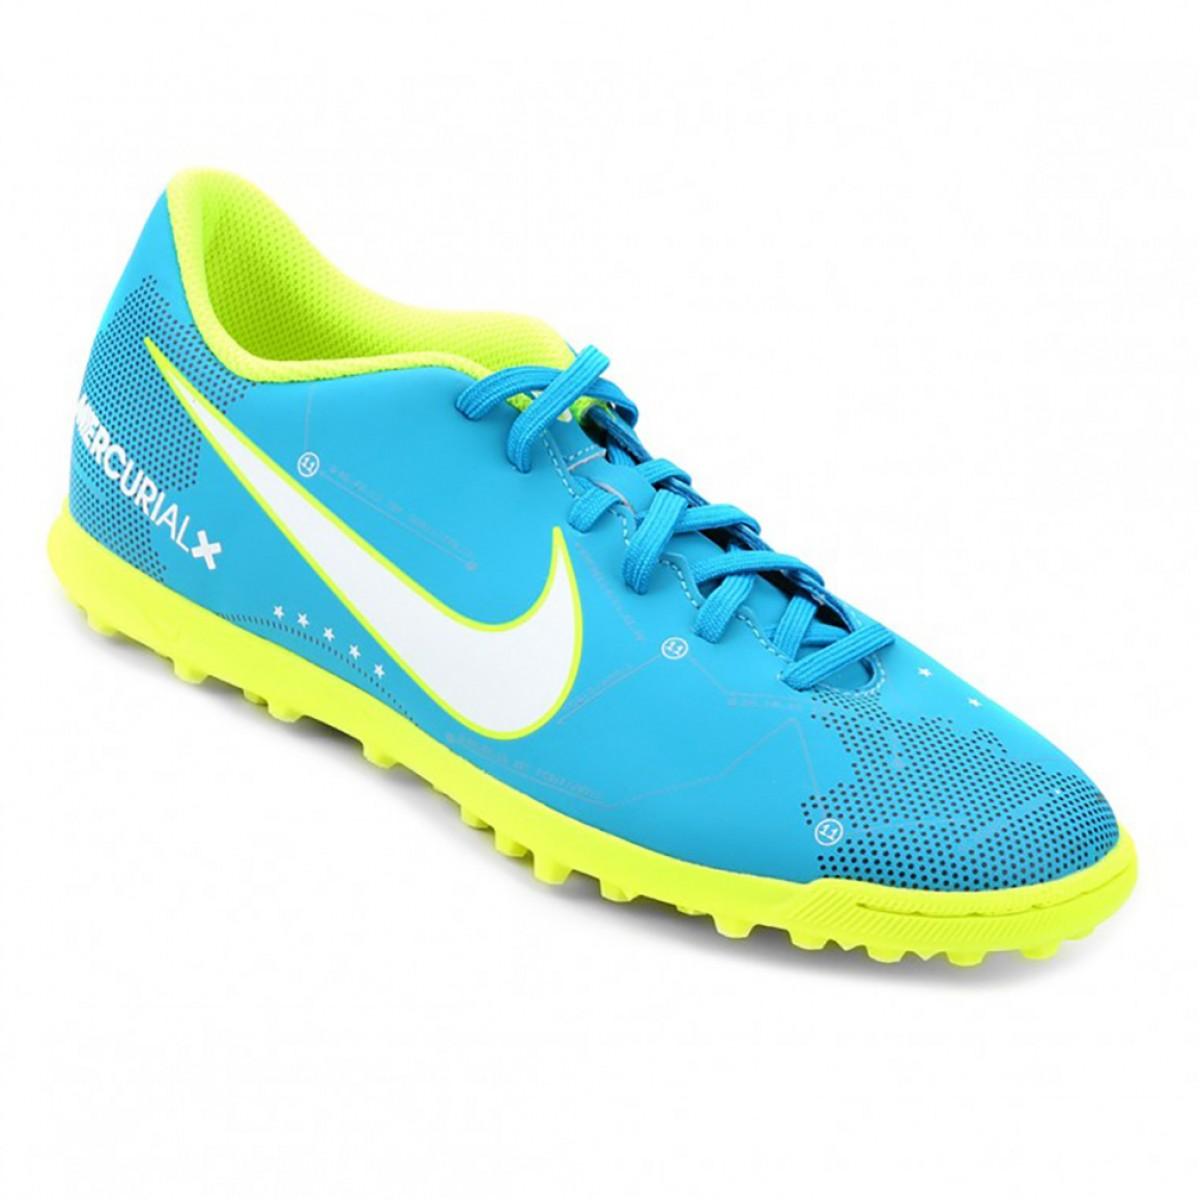 faedfd32c21 Chuteira Nike Mercural Vortex III Neymar Junior Azul - Compre Agora ...